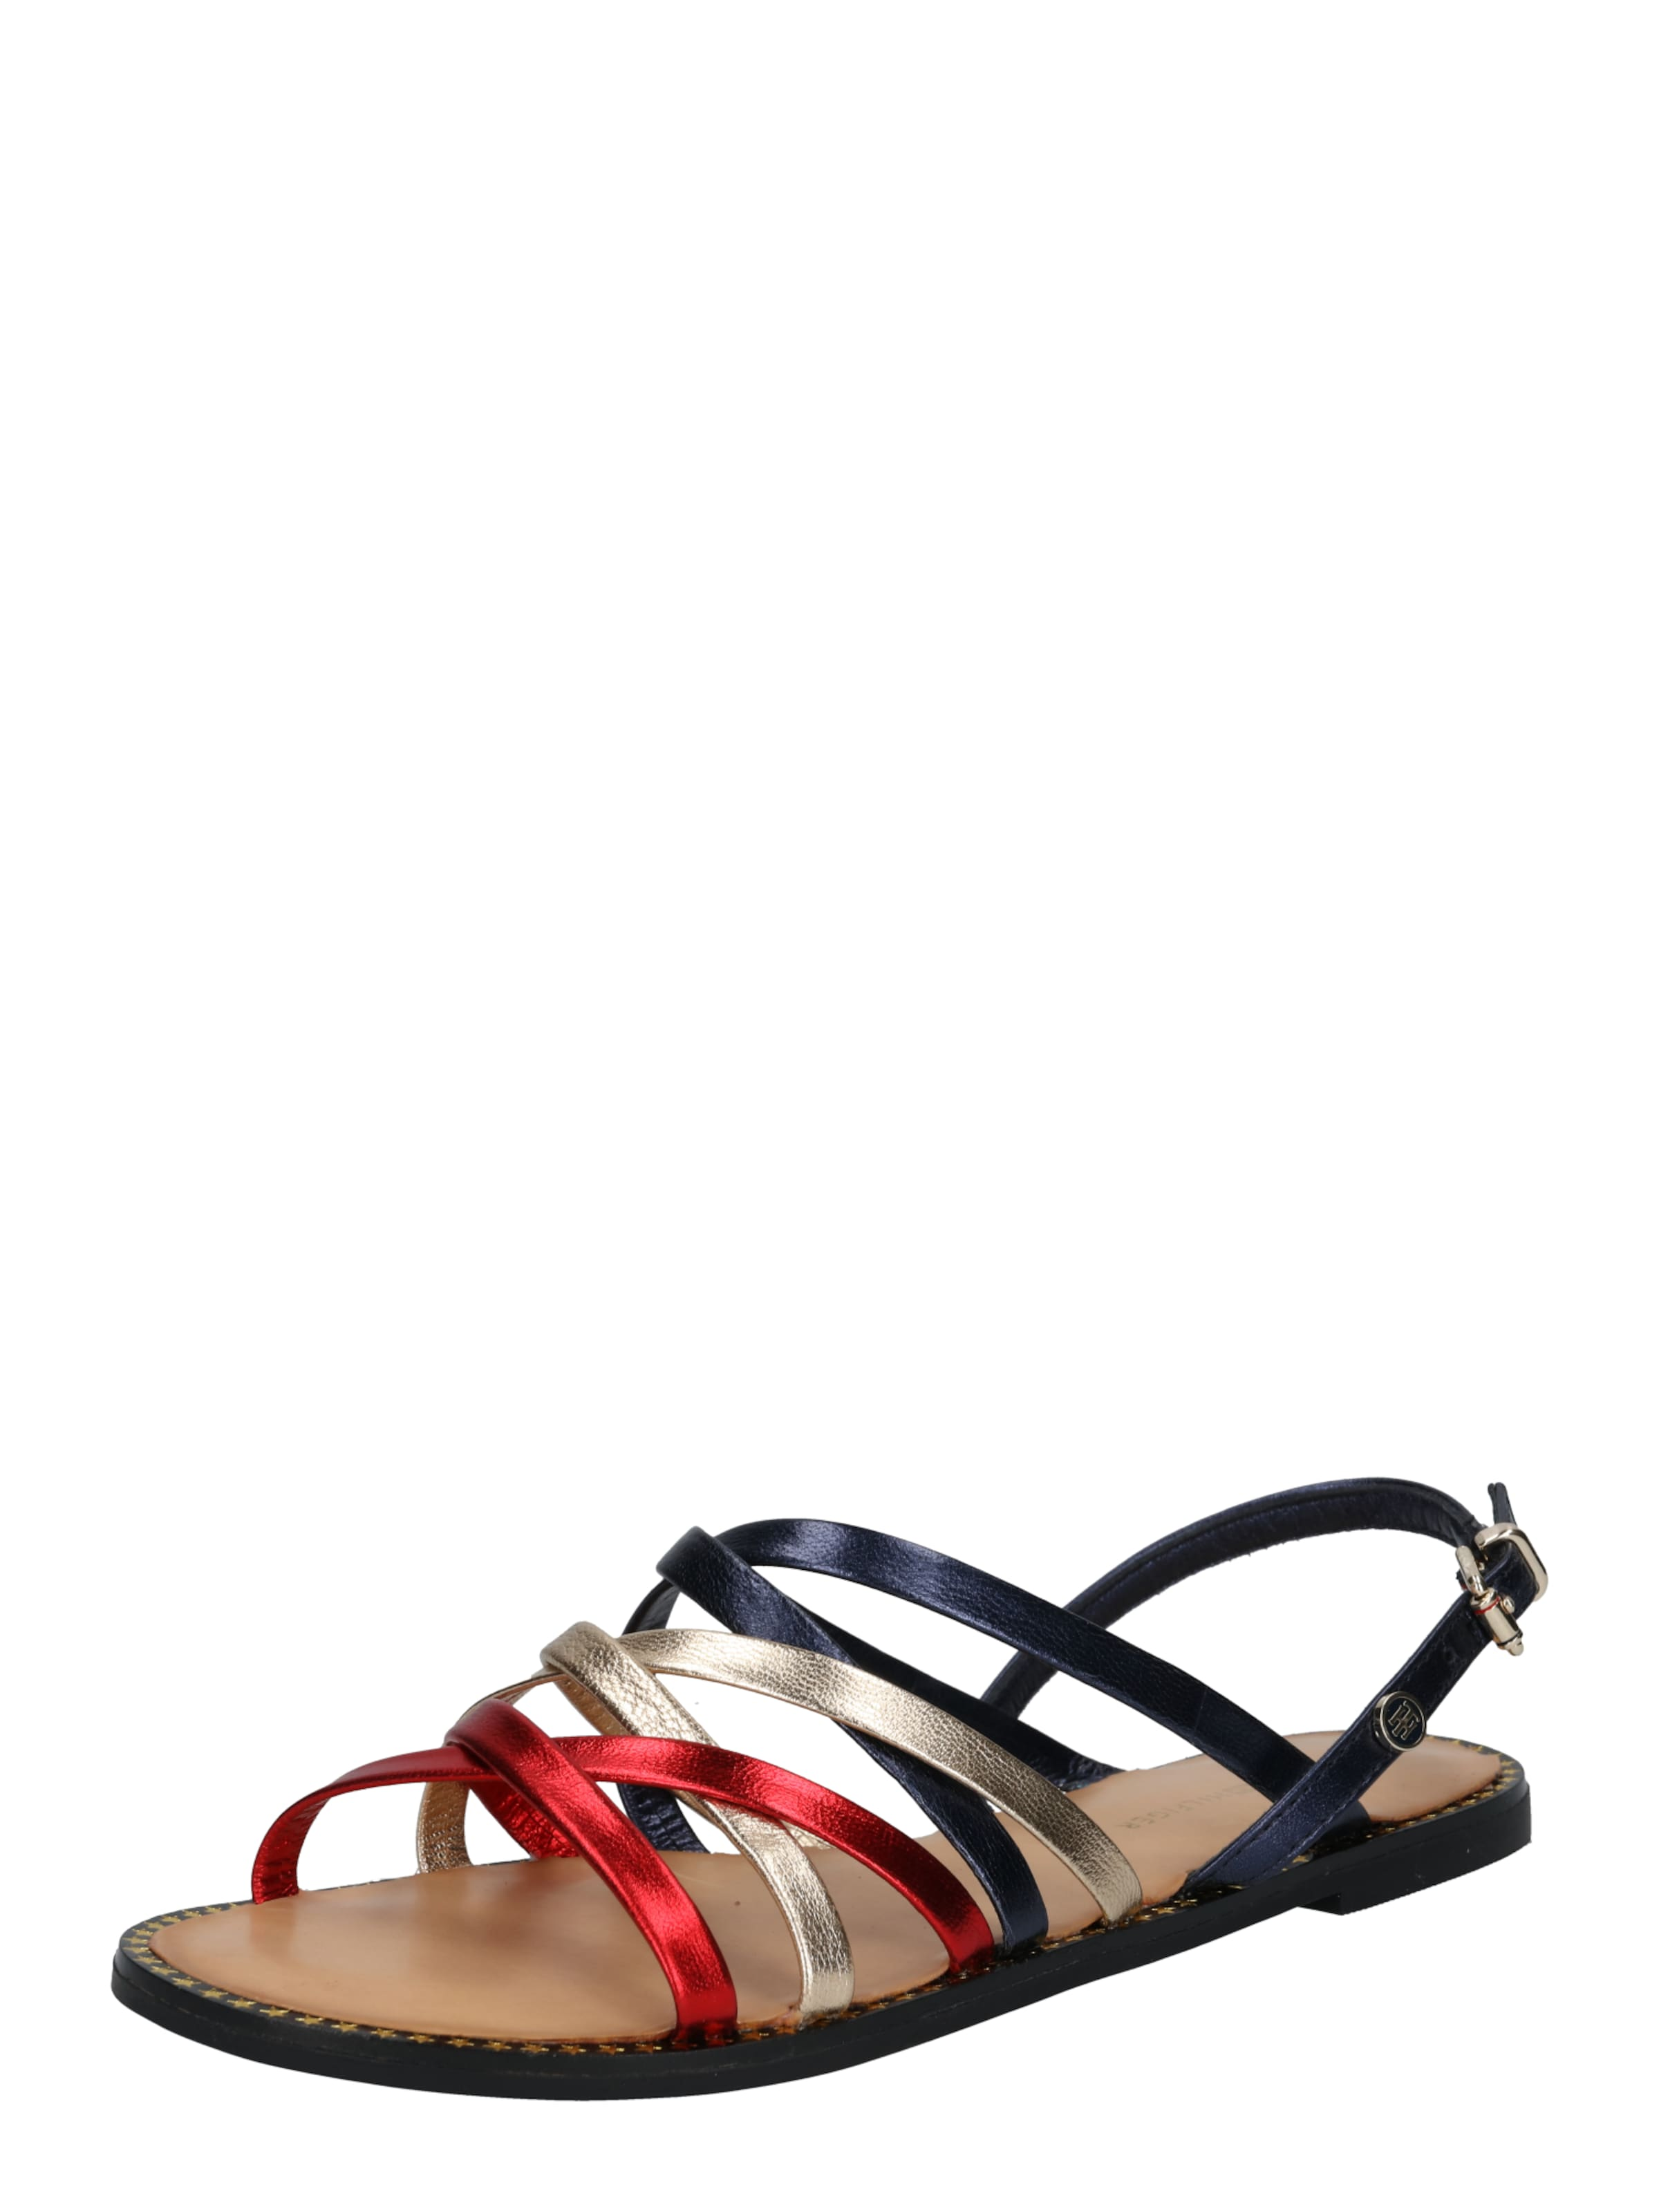 Haltbare Mode billige Schuhe TOMMY HILFIGER | Riemchensandale Schuhe Schuhe Schuhe Gut getragene Schuhe 88cbc8